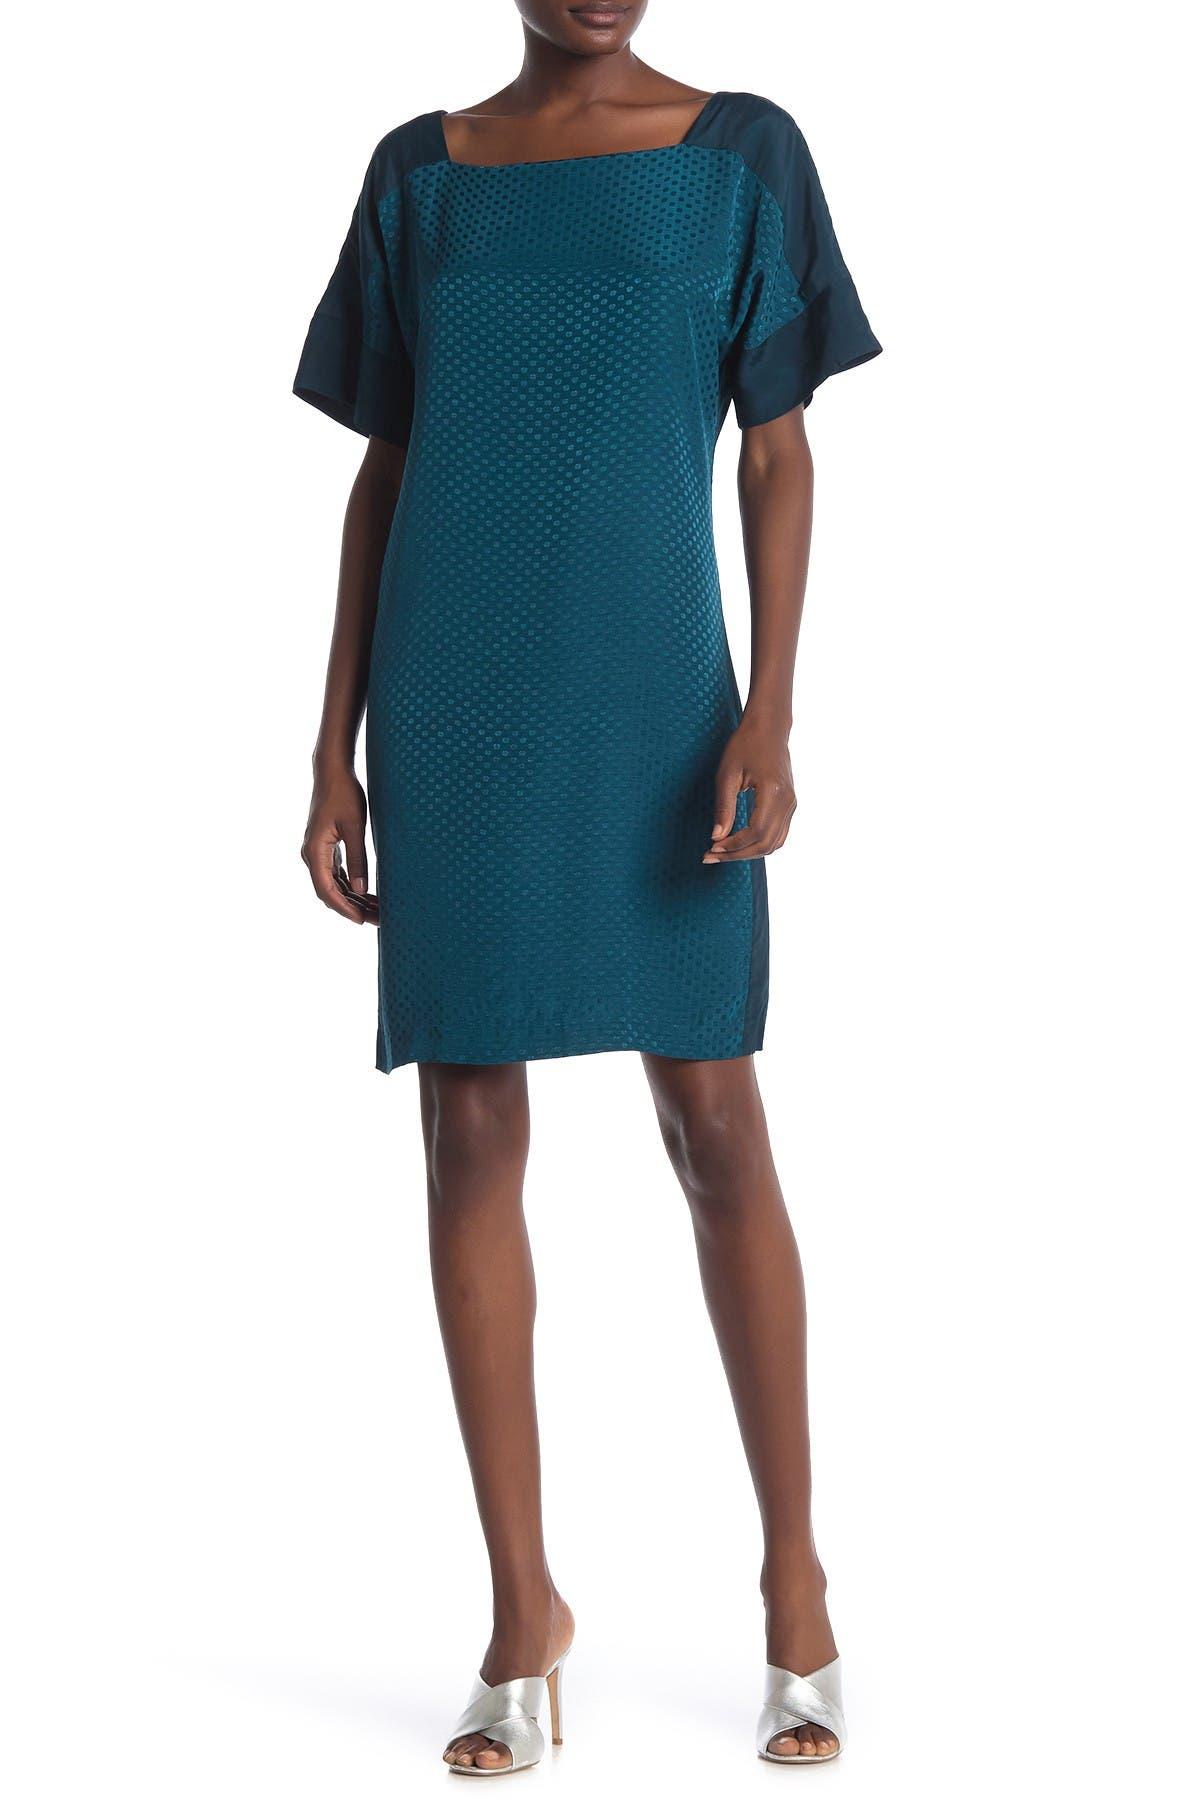 Image of CLUB MONACO Achmand Tonal Dot Print Shift Dress